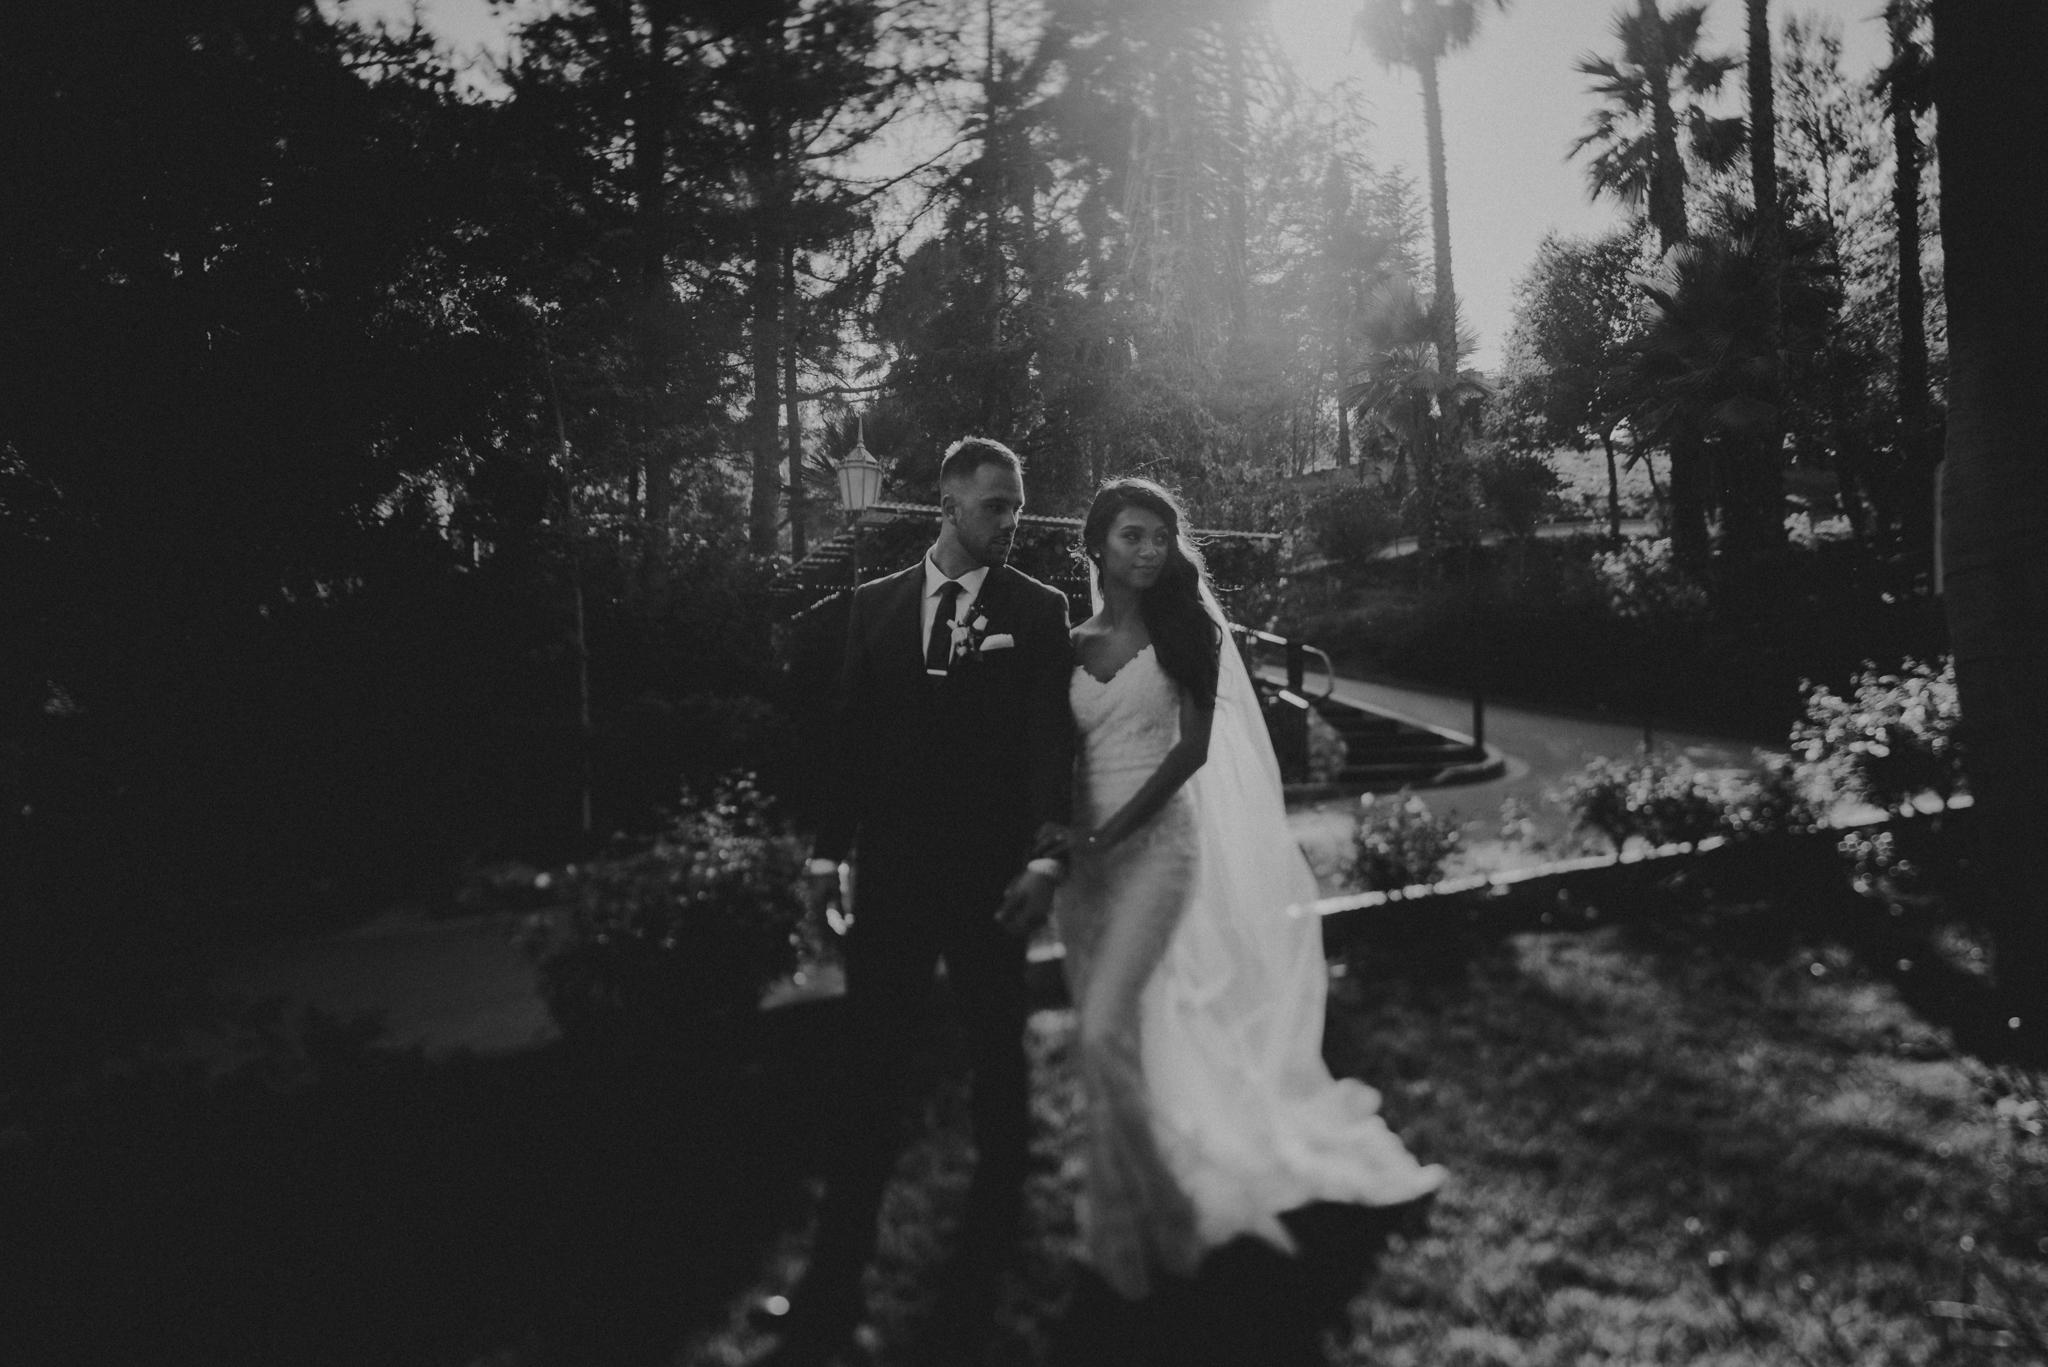 Isaiah + Taylor Photography - Rancho Las Lomas Wedding, Los Angeles Wedding Photographer-094.jpg